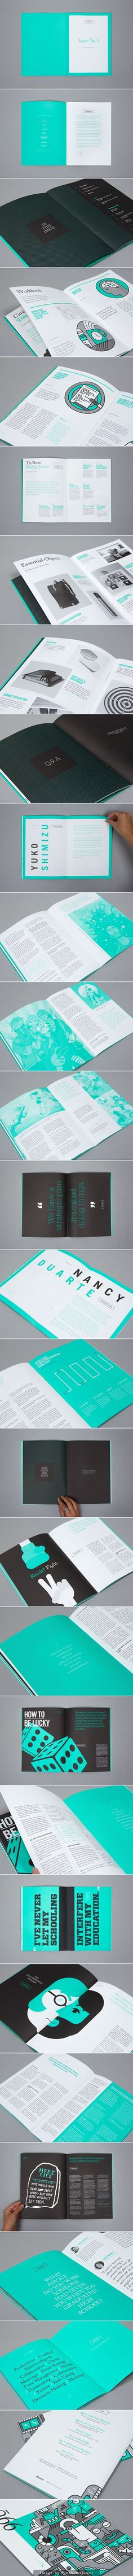 99U Quarterly Magazine Issue No3